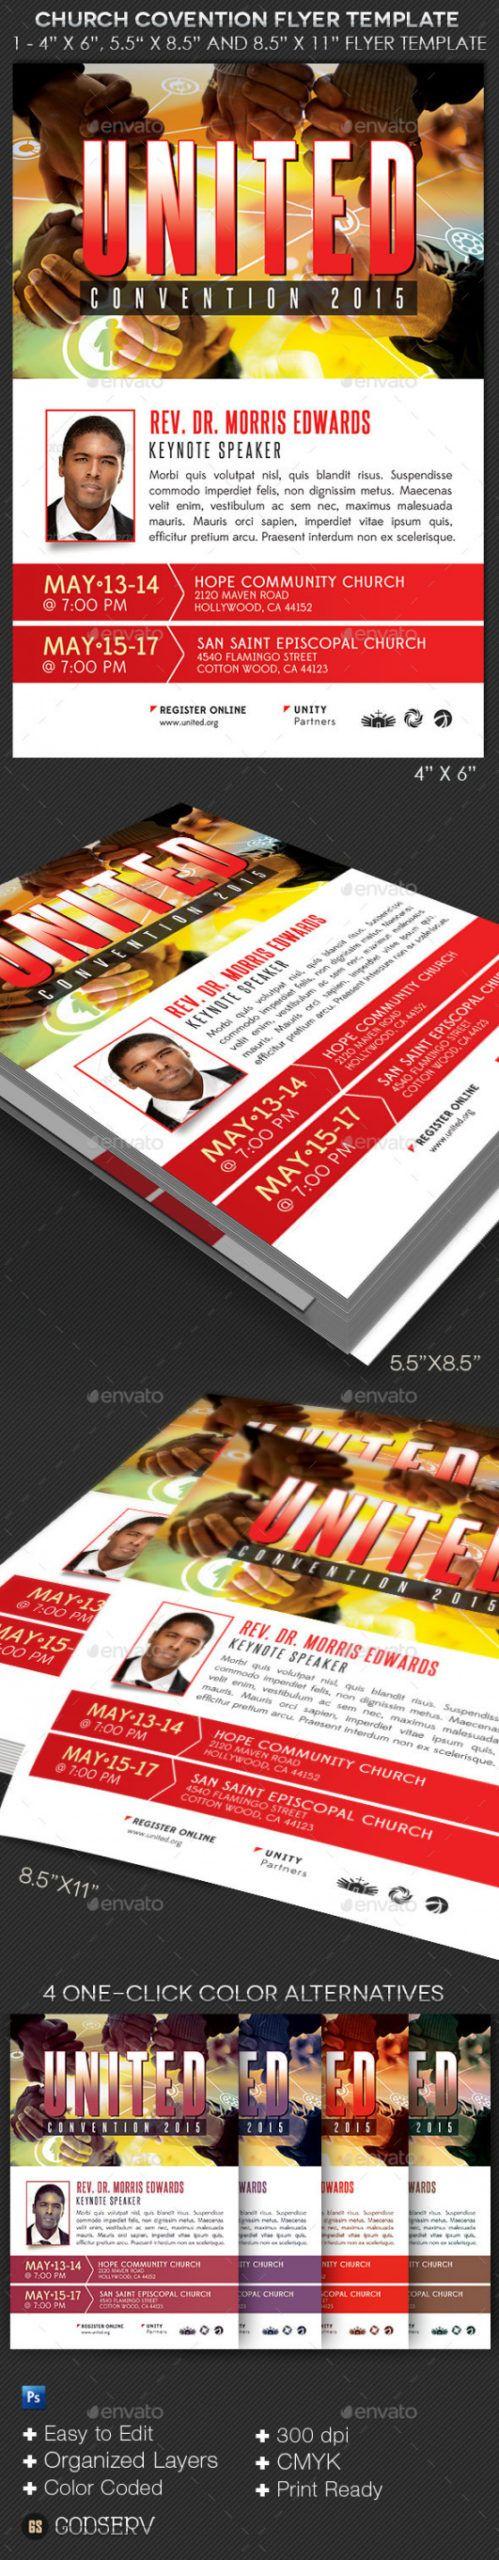 free motivational speaker flyer graphics designs & templates motivational speaker flyer template